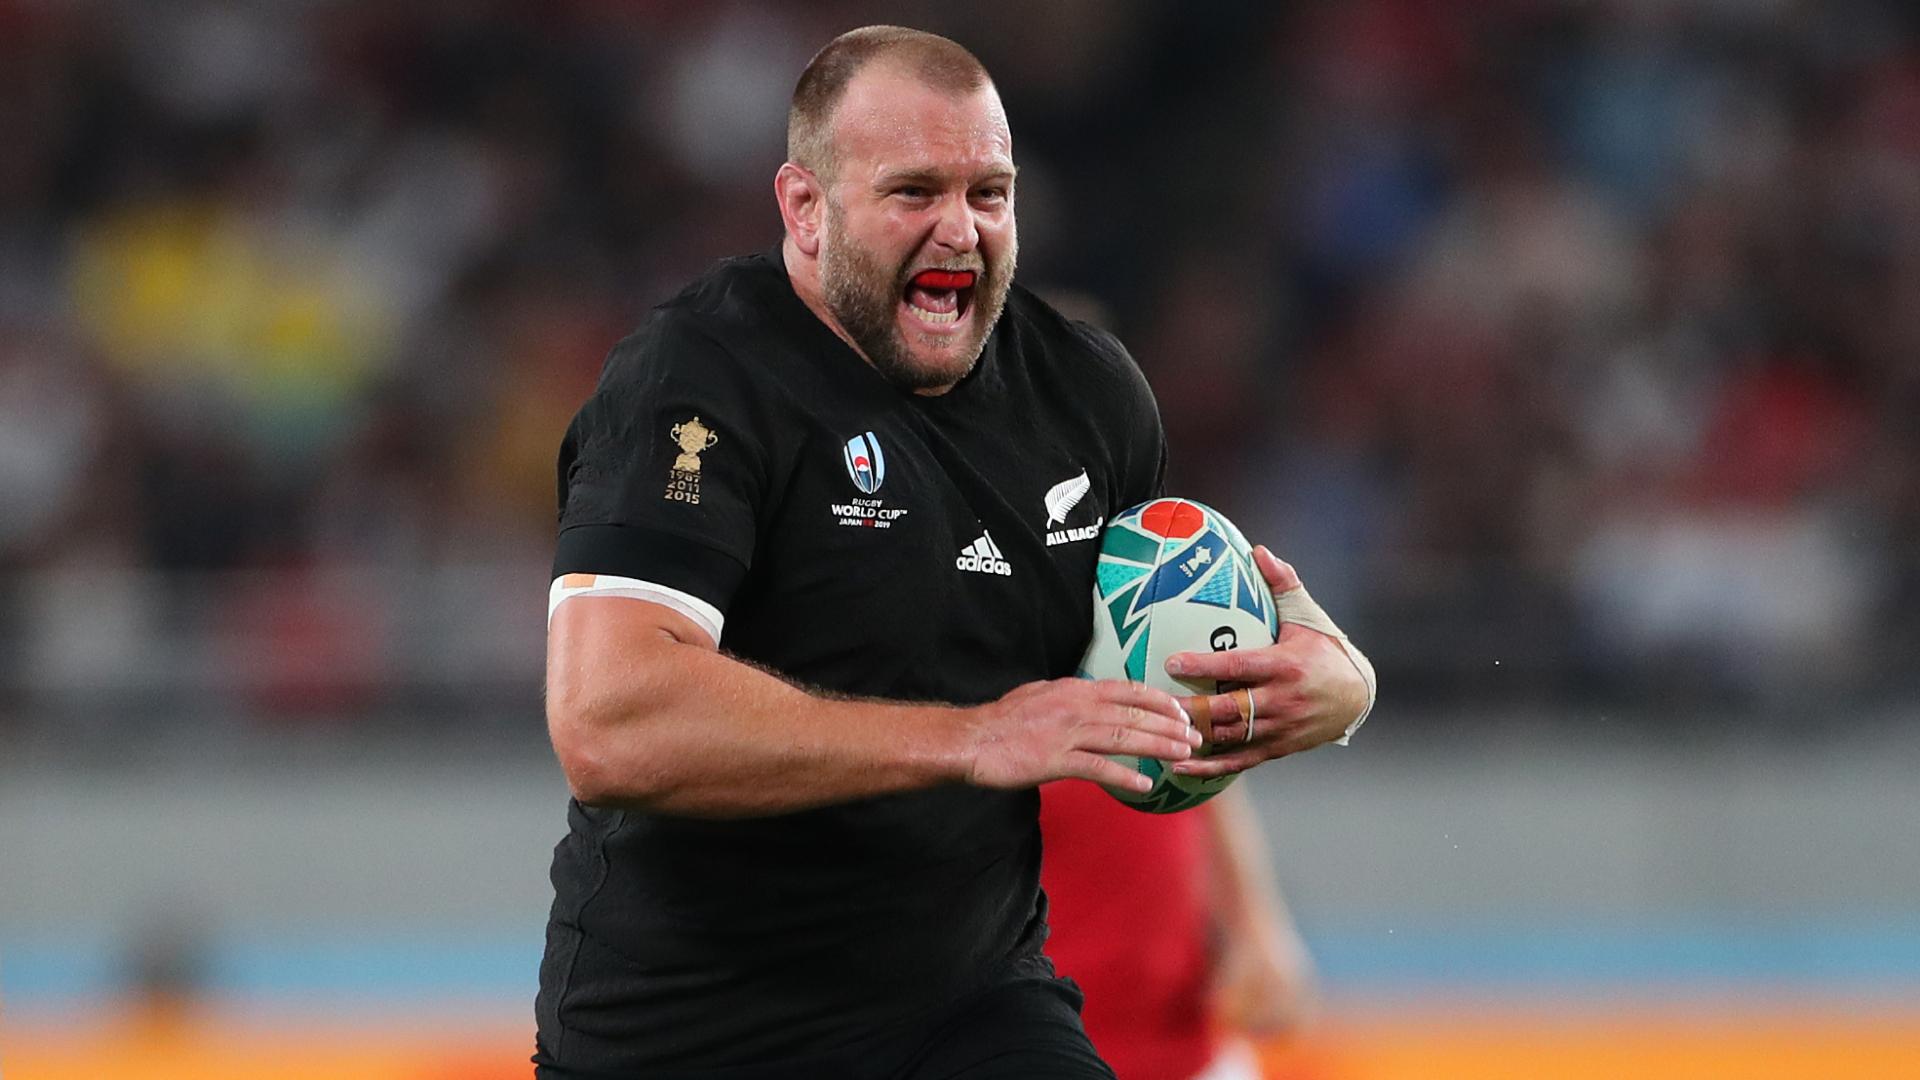 Moody set for 50th Test as All Blacks make three changes for Pumas clash